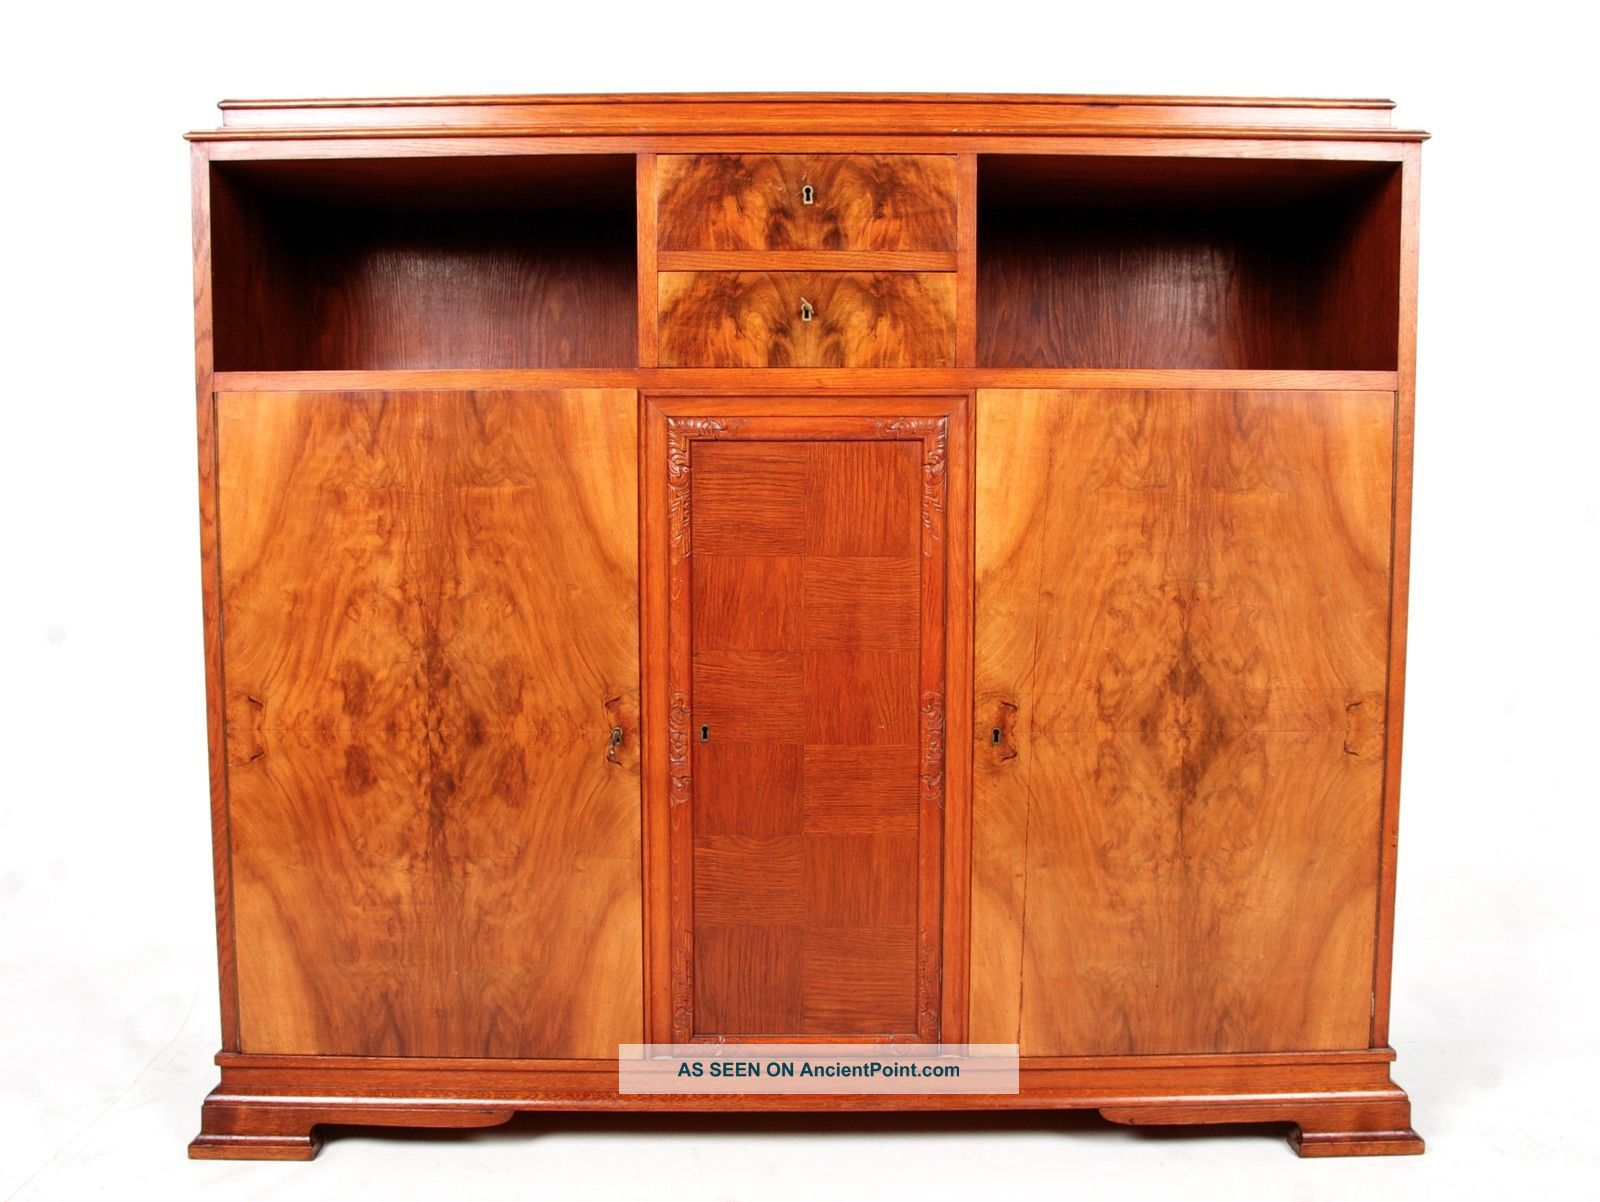 Antique Biedermeier Sideboard Swedish Highboard Credenza Bookcase Fine Quality W 1900-1950 photo